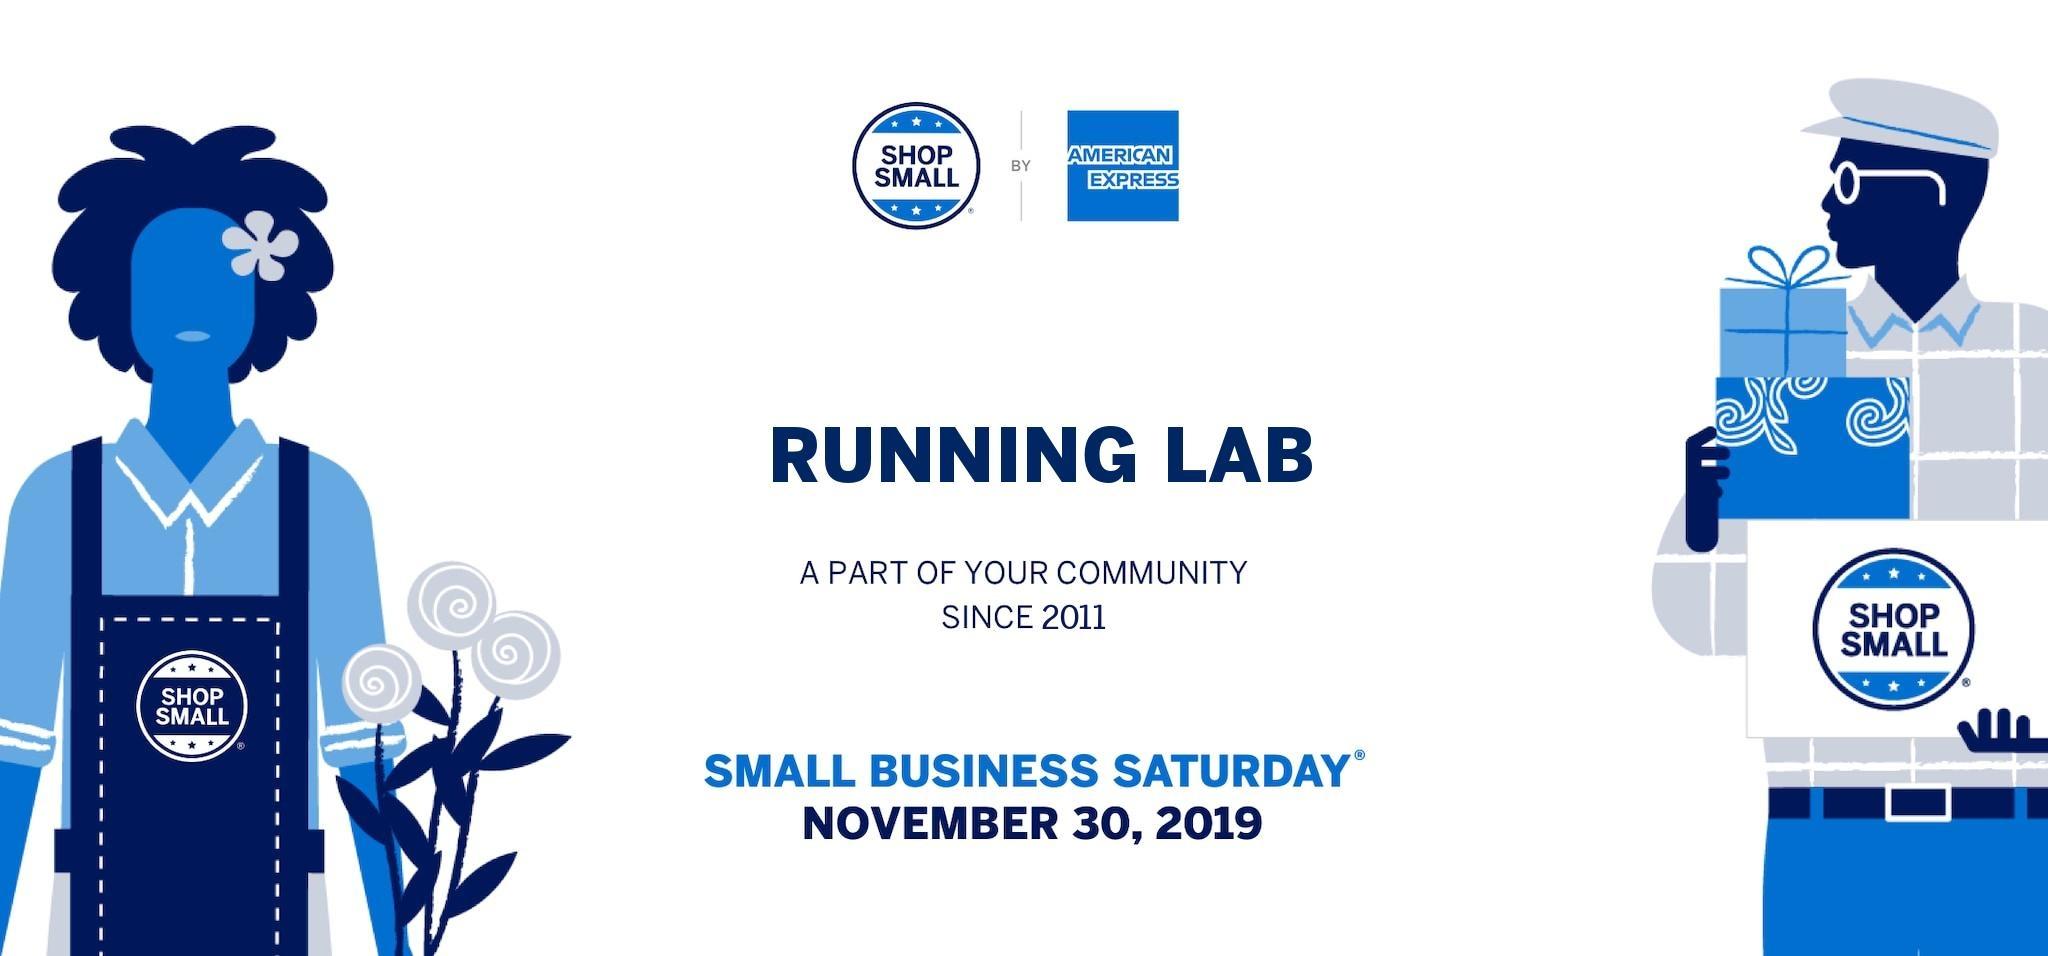 Running Lab Small Business Saturday